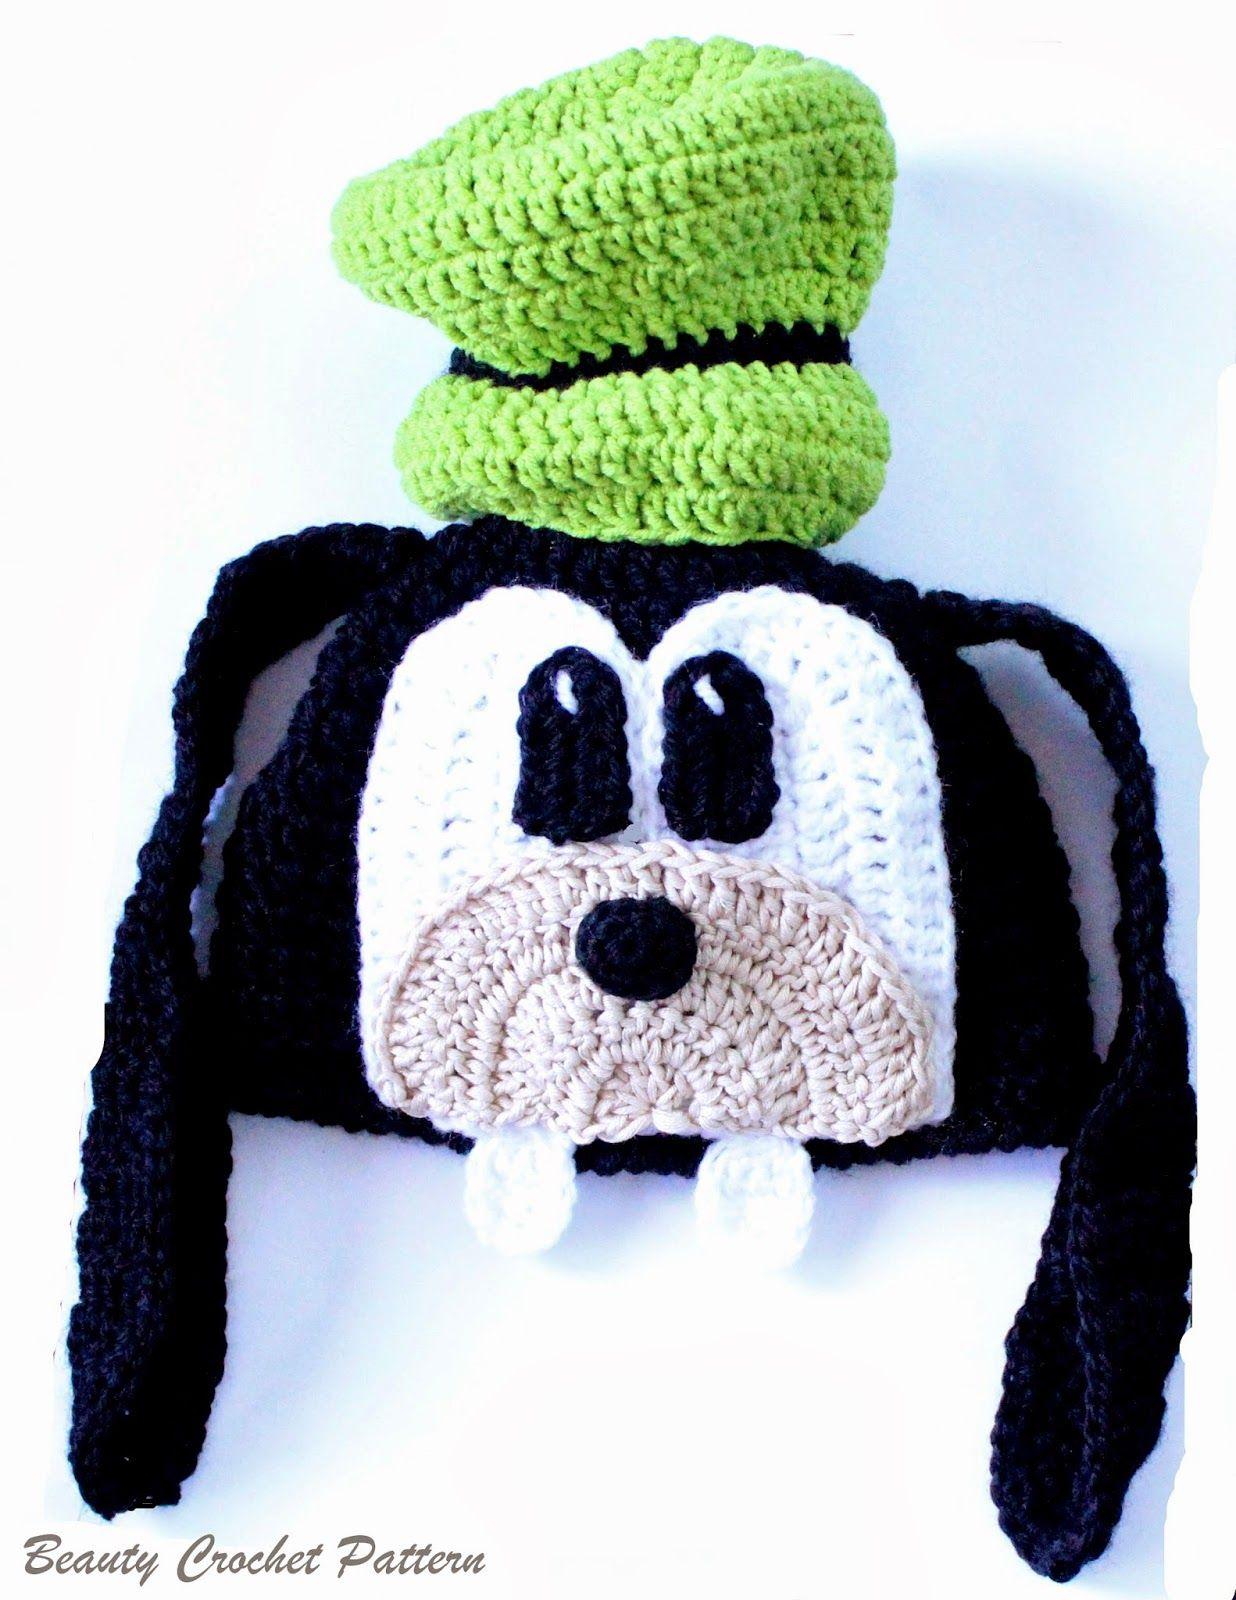 Goofy Crochet Hat | Crochet | Pinterest | Crochet, Patterns and Yarns